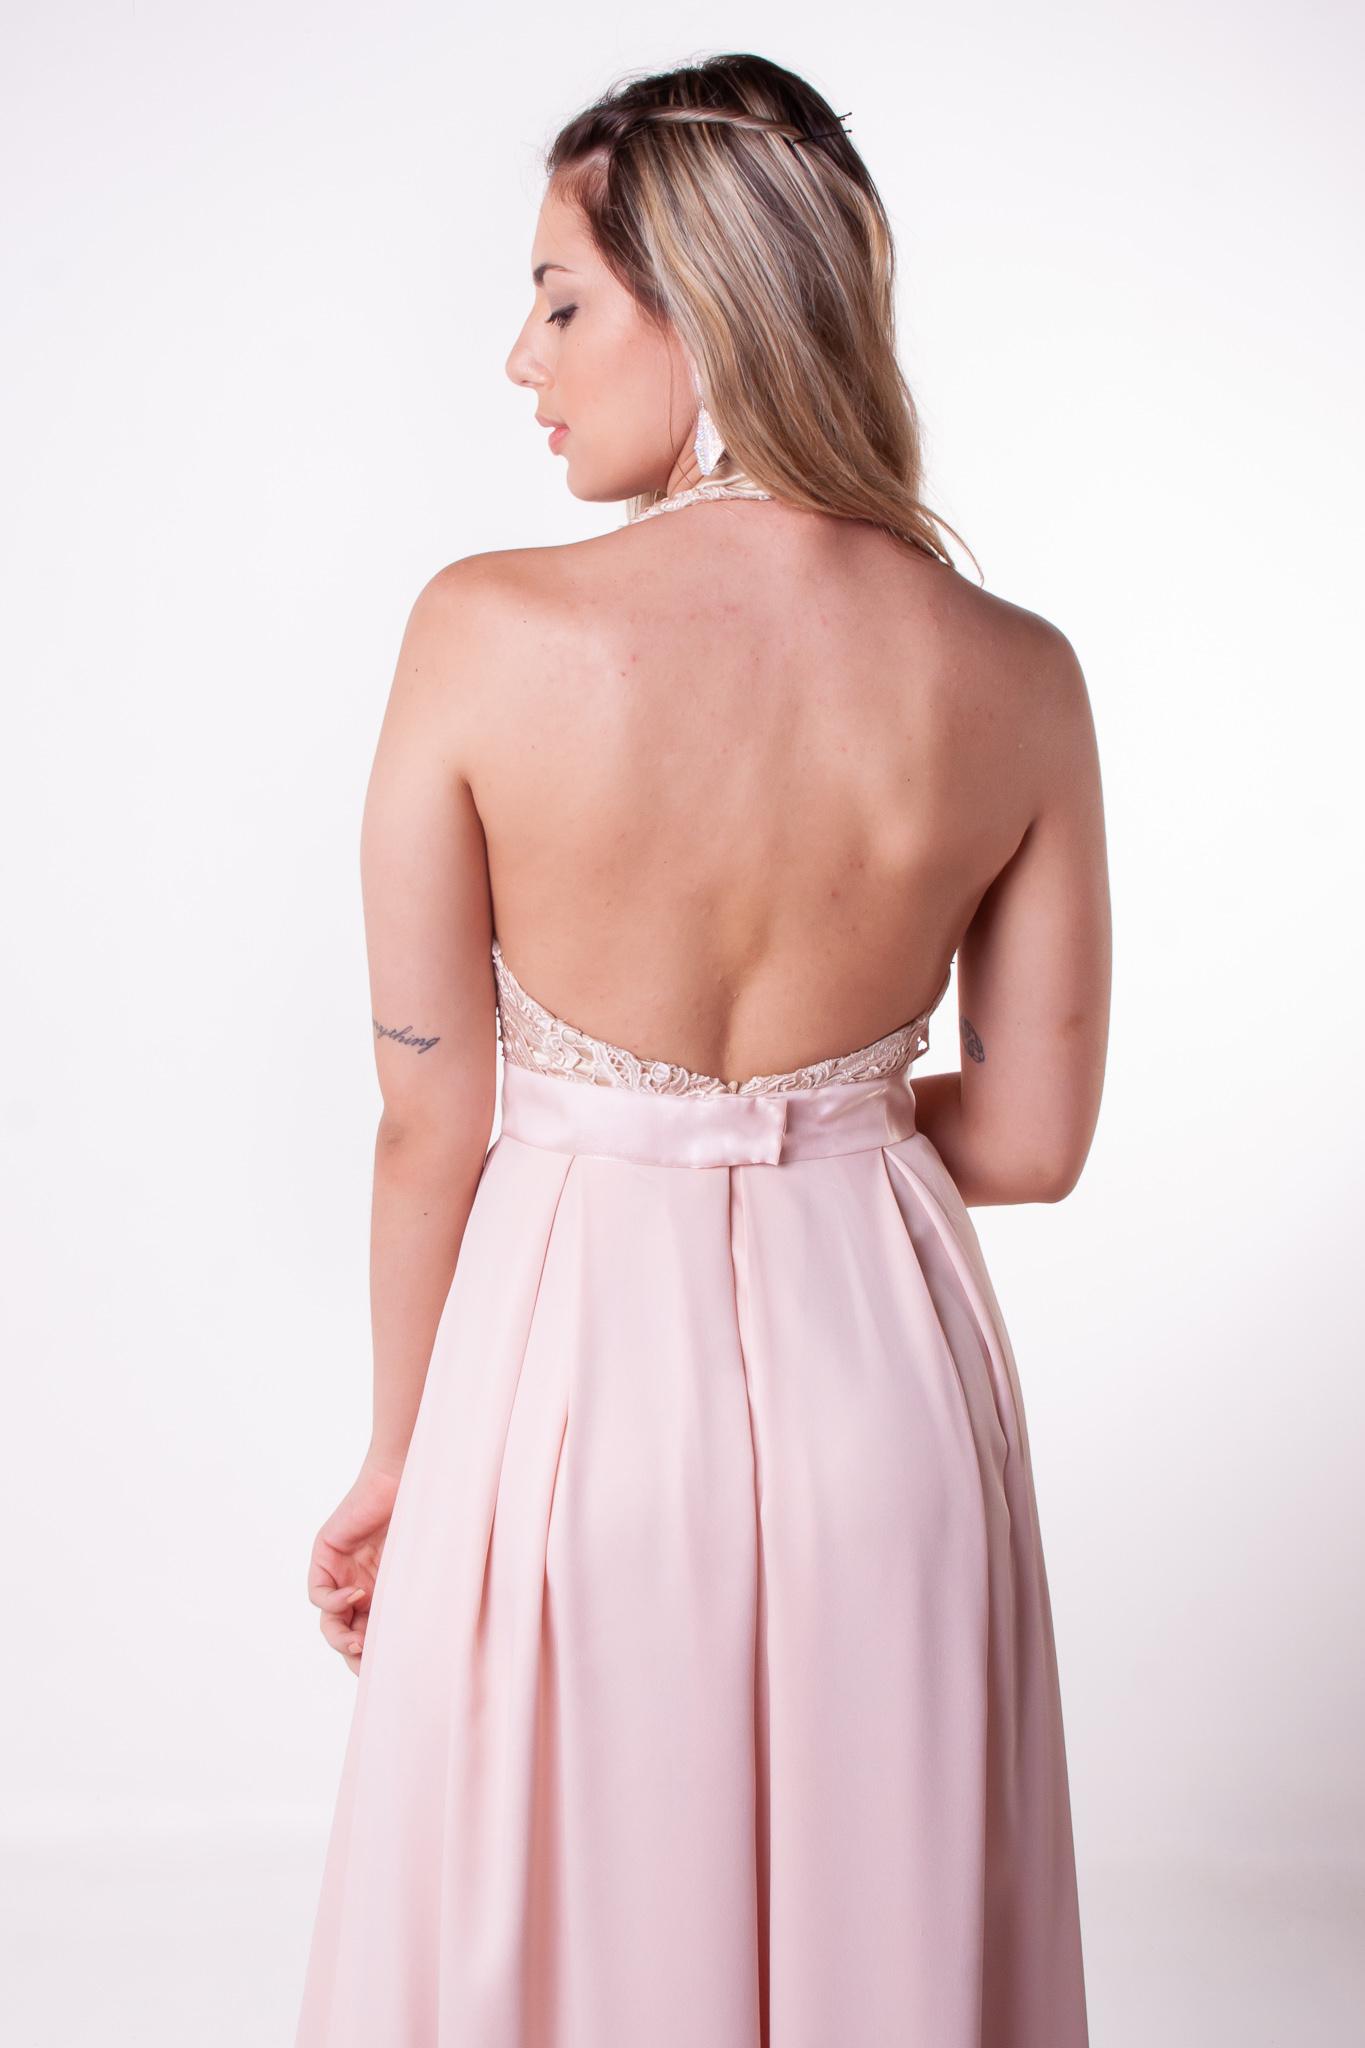 16 - Vestido rosê open back